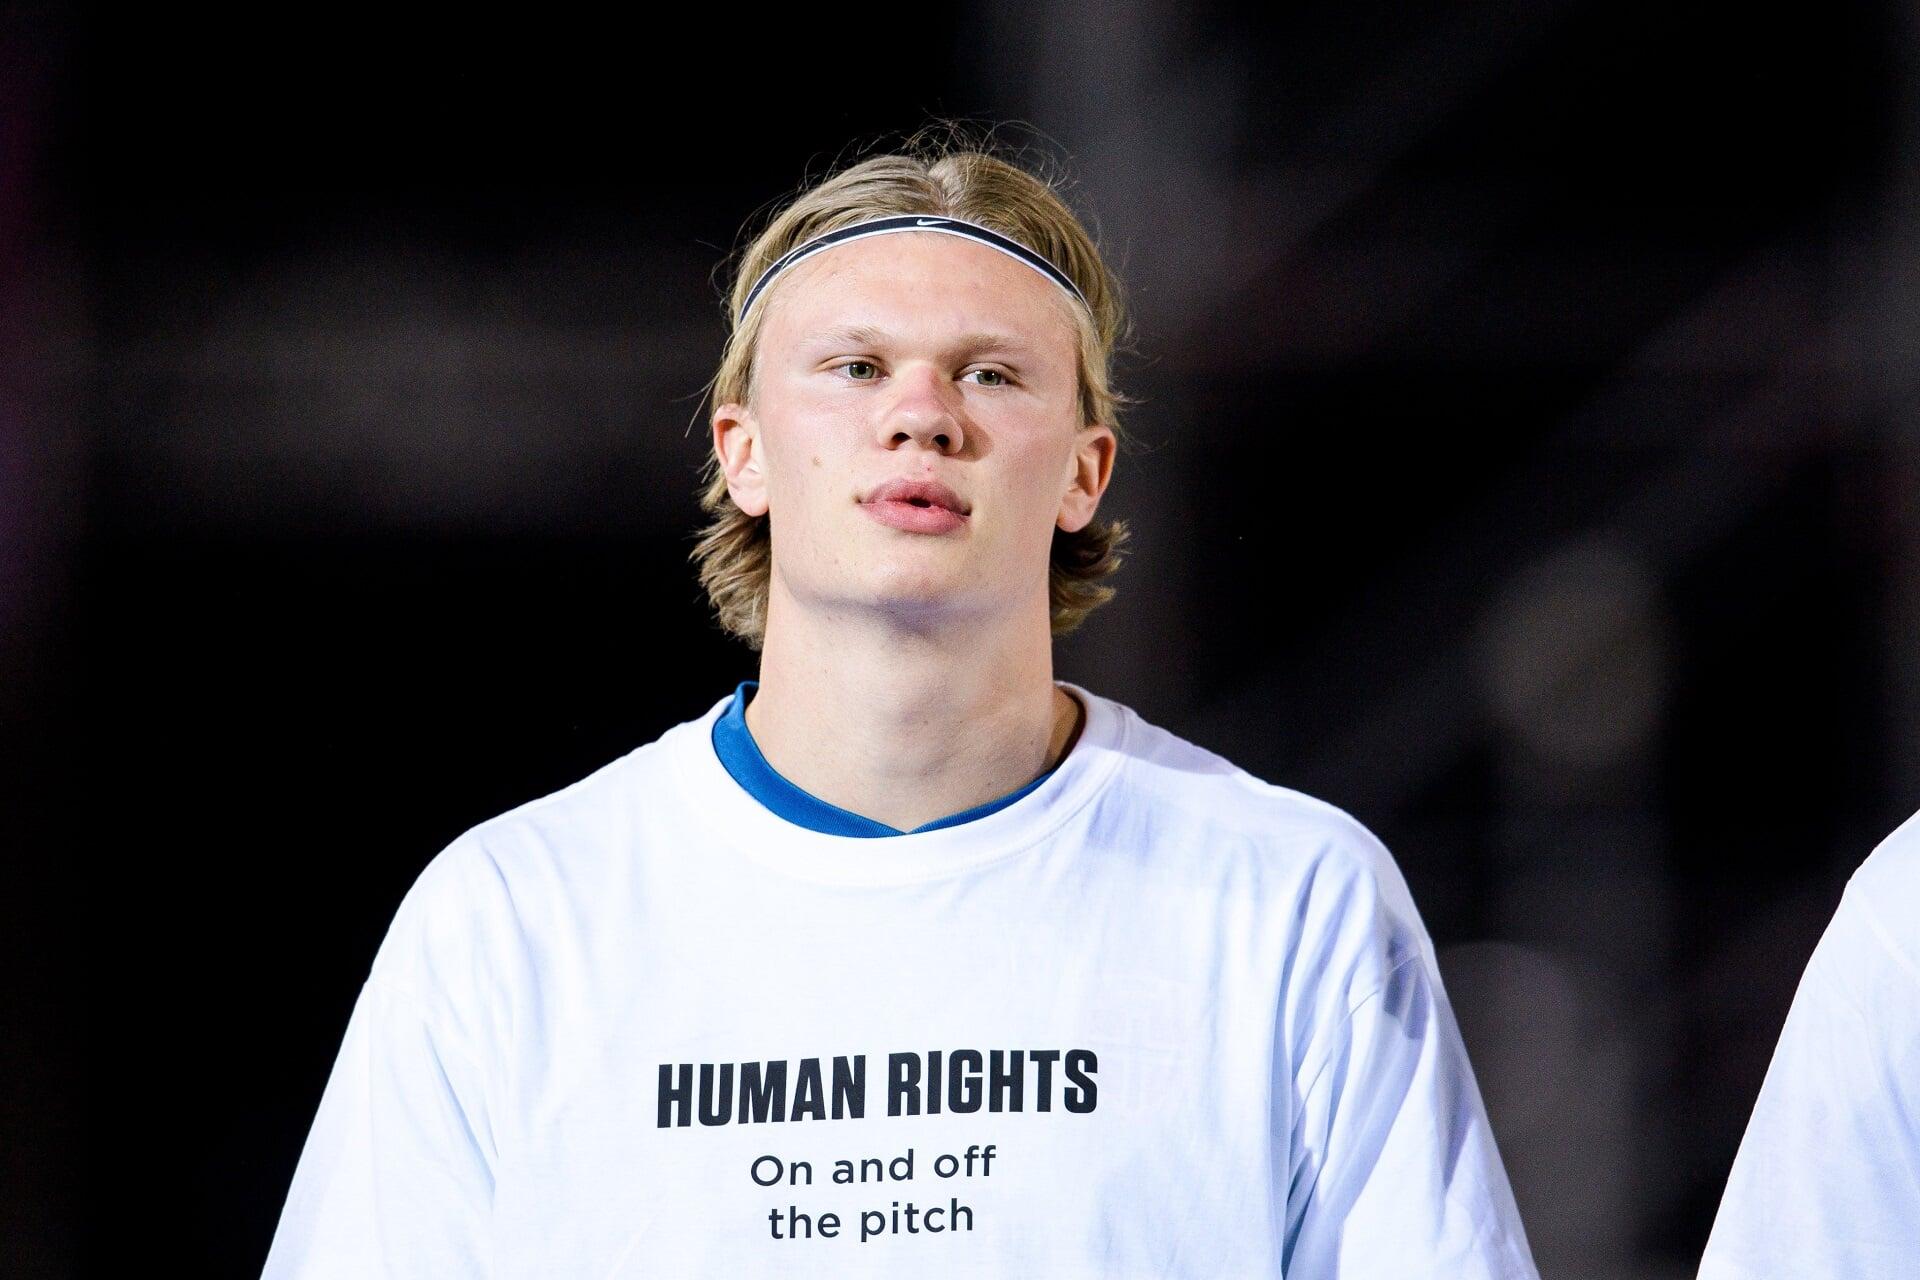 ФИФА не накажет сборную Норвегии за футболки о ситуации с правами человека в Катаре: «Верим в мощь футбола как силы добра»